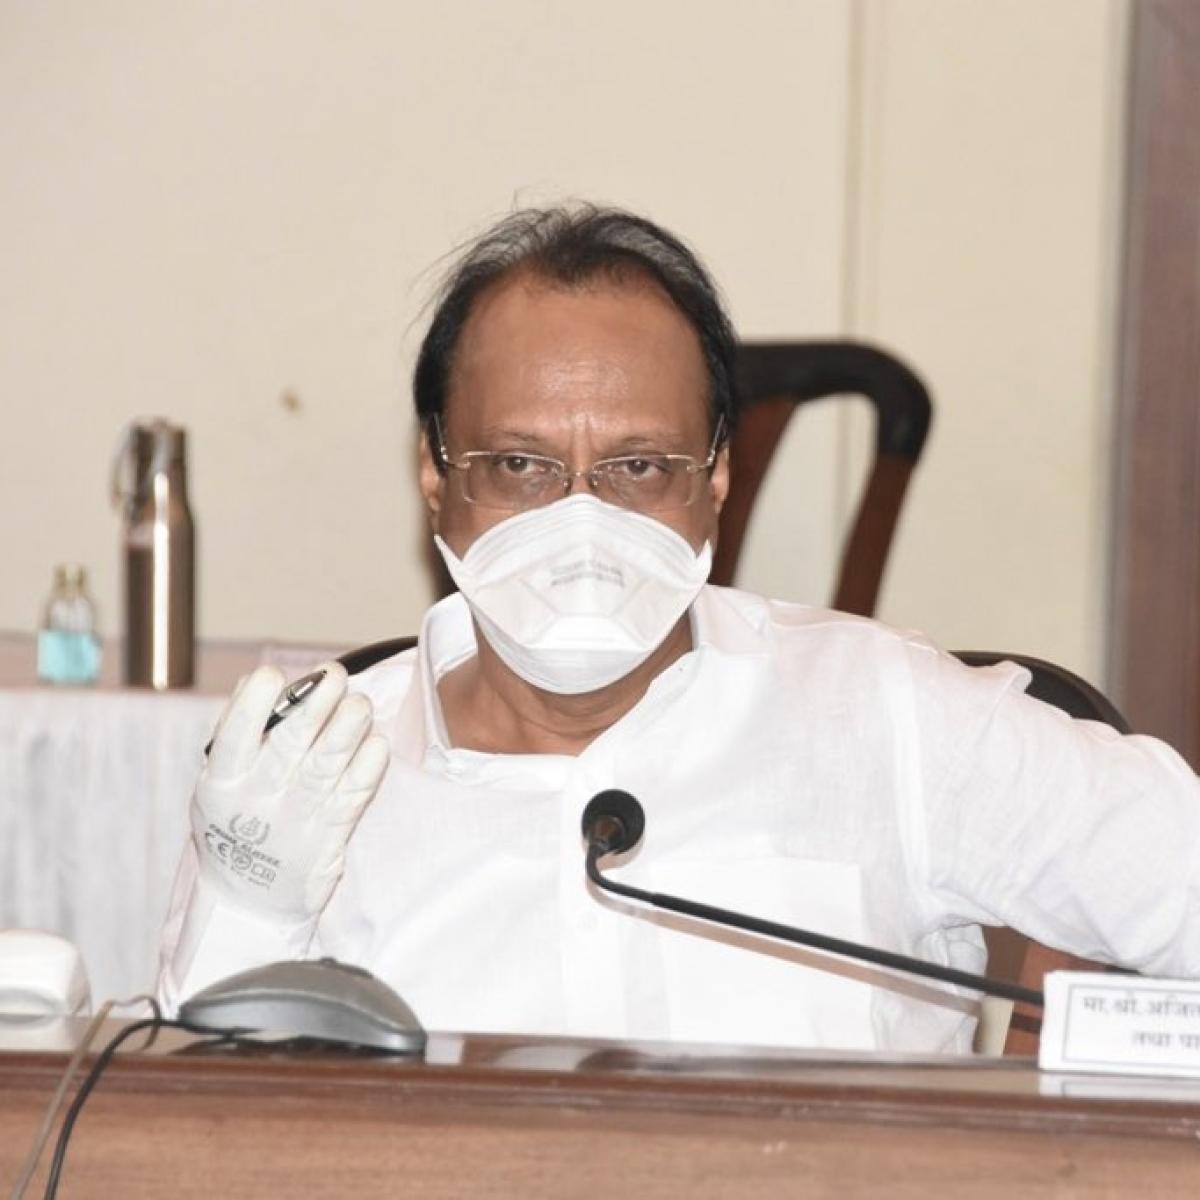 Strict action will be taken against Sharjeel Usmani post-probe: Maha Deputy CM Ajit Pawar